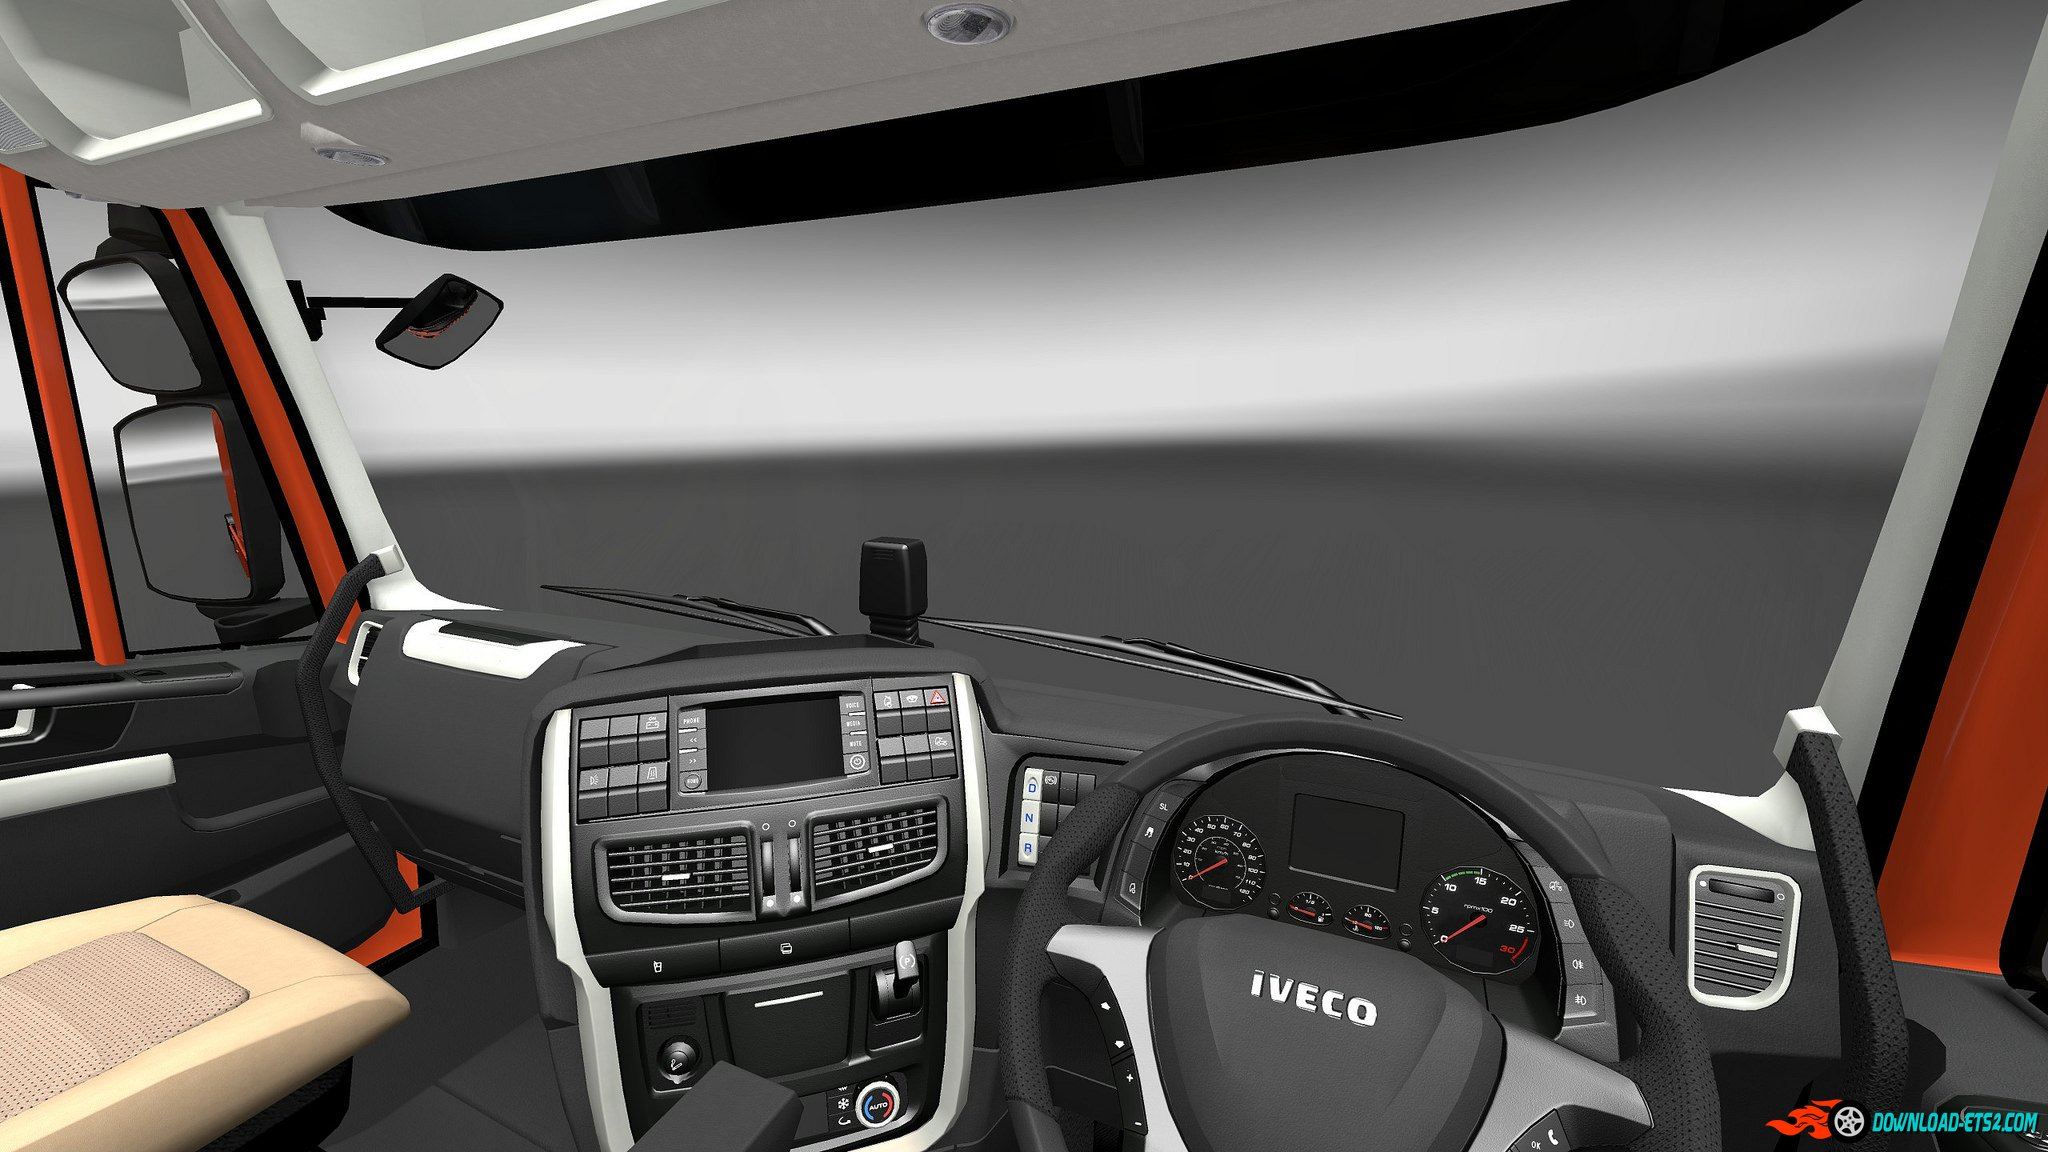 Iveco Stralis Hi-Way Interior/Exterior Rework v1.1